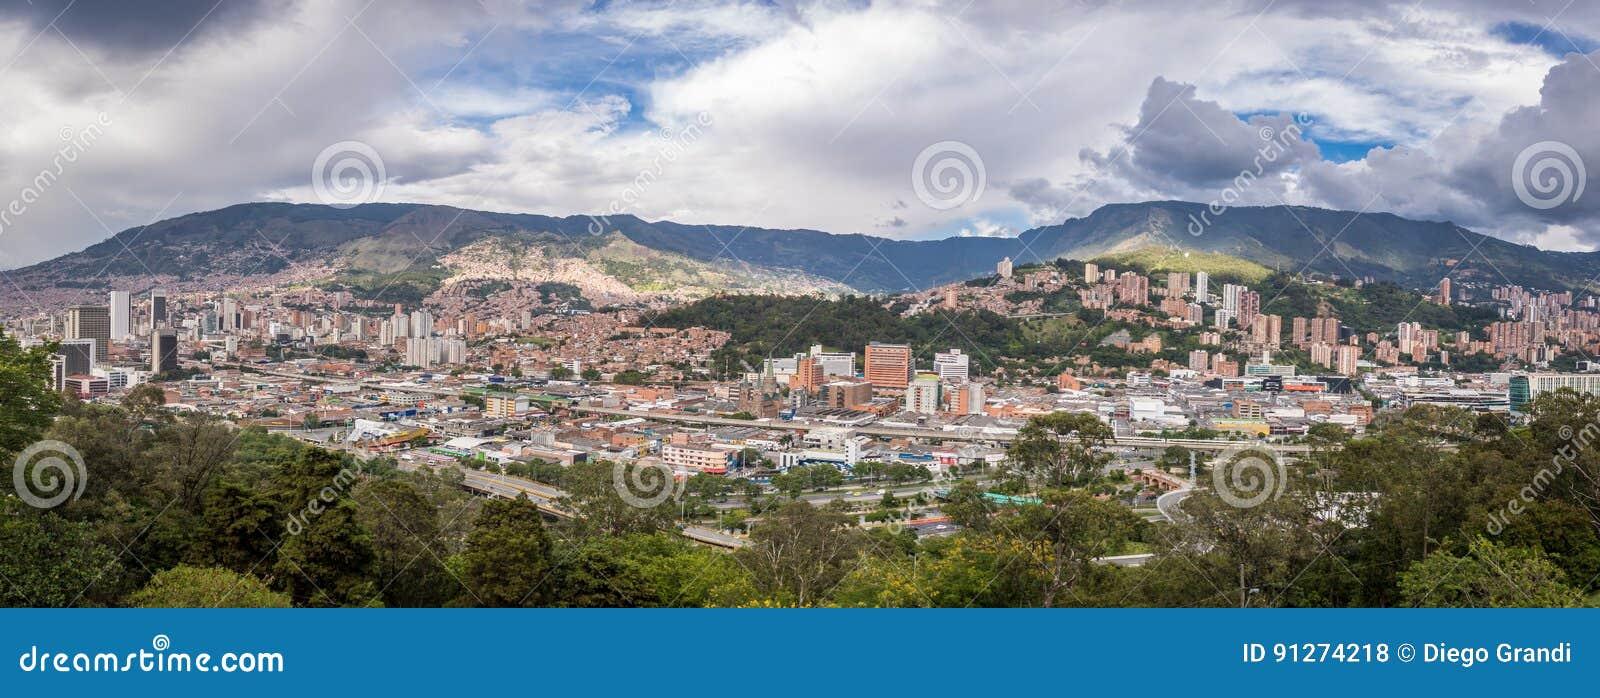 Панорамный взгляд Medellin, Колумбии